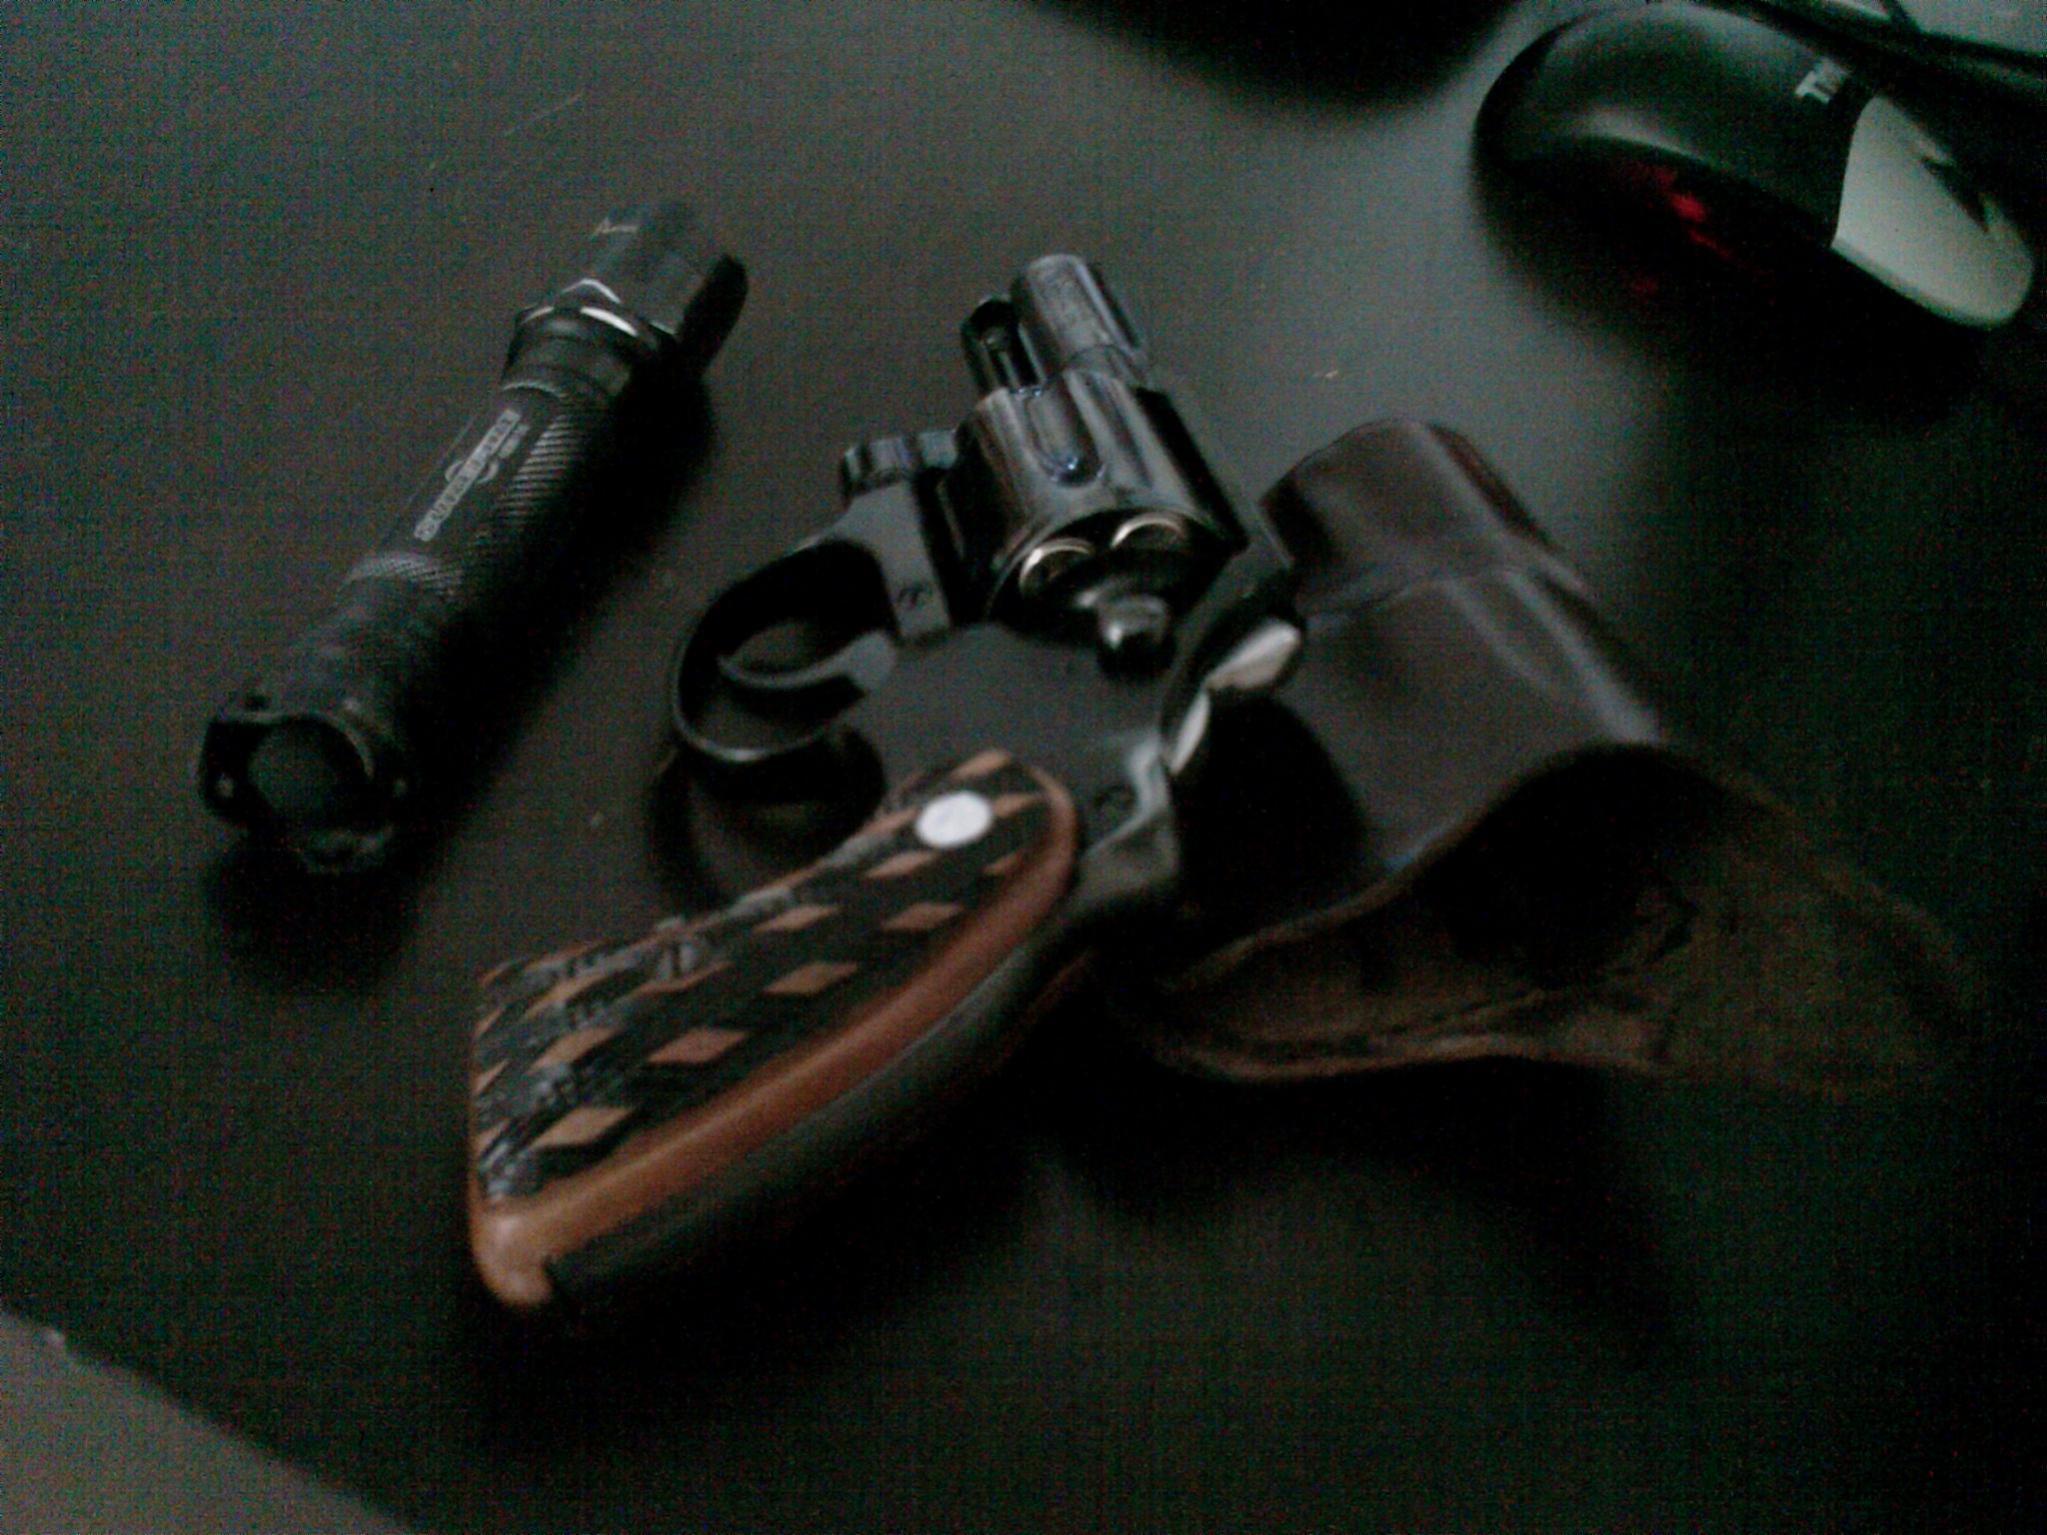 My Colt cobra with it's new tweak-imag0155.jpg